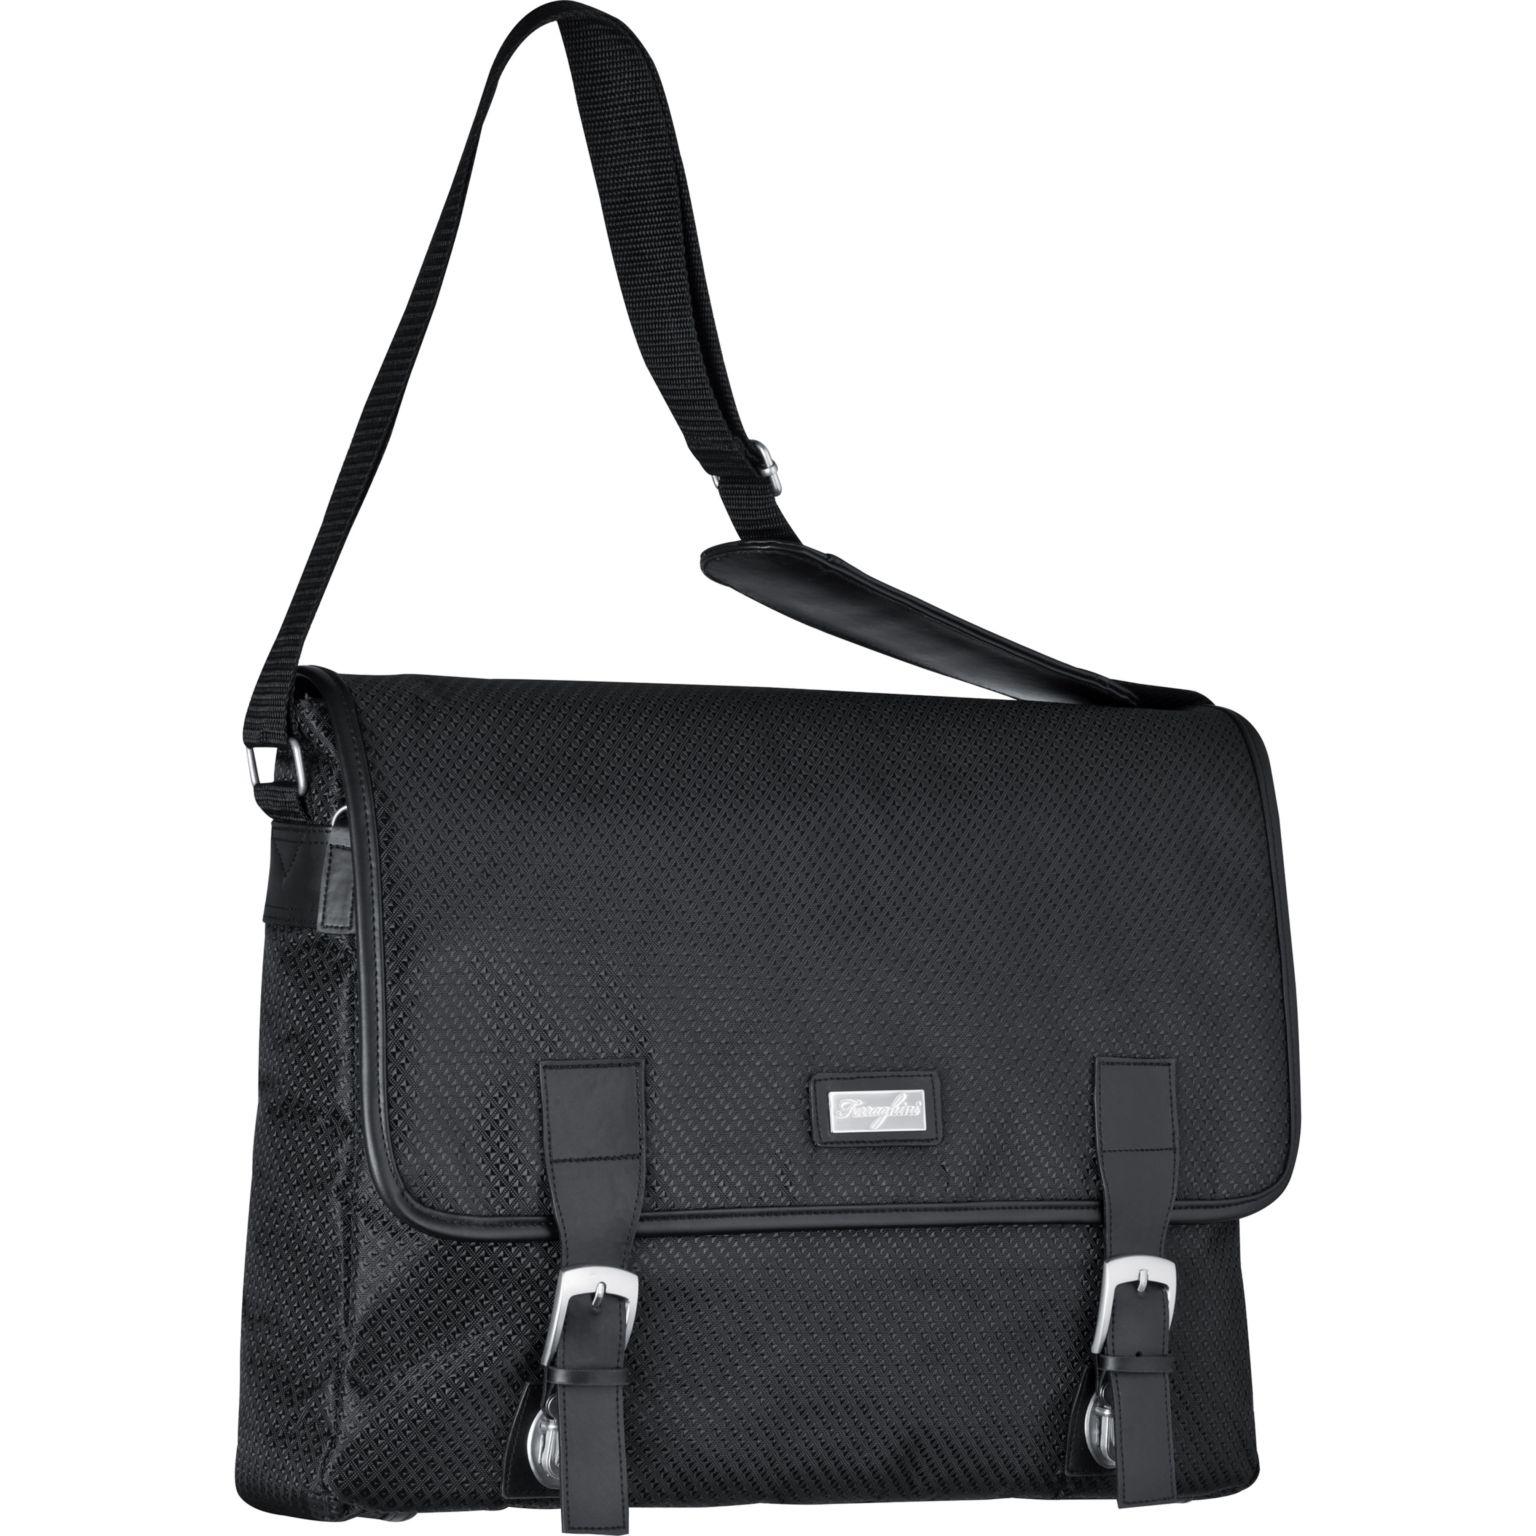 Ferraghini laptop bag with a flap